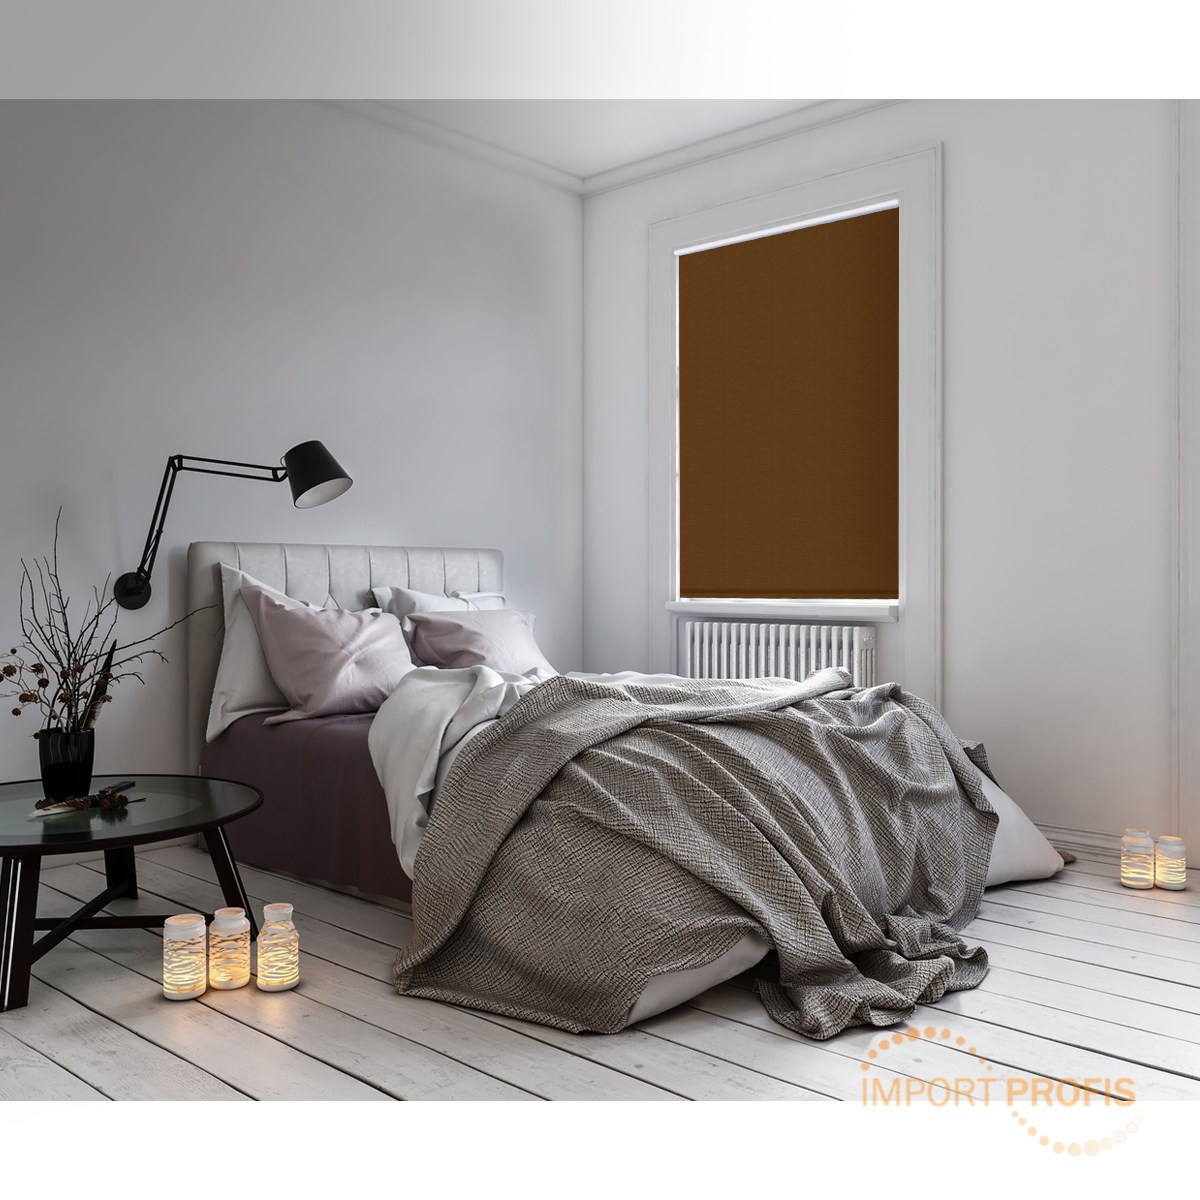 verdunkelungsrollo verdunkelsrollo klemmfix ohne bohren seitenzug rollo fenster ebay. Black Bedroom Furniture Sets. Home Design Ideas